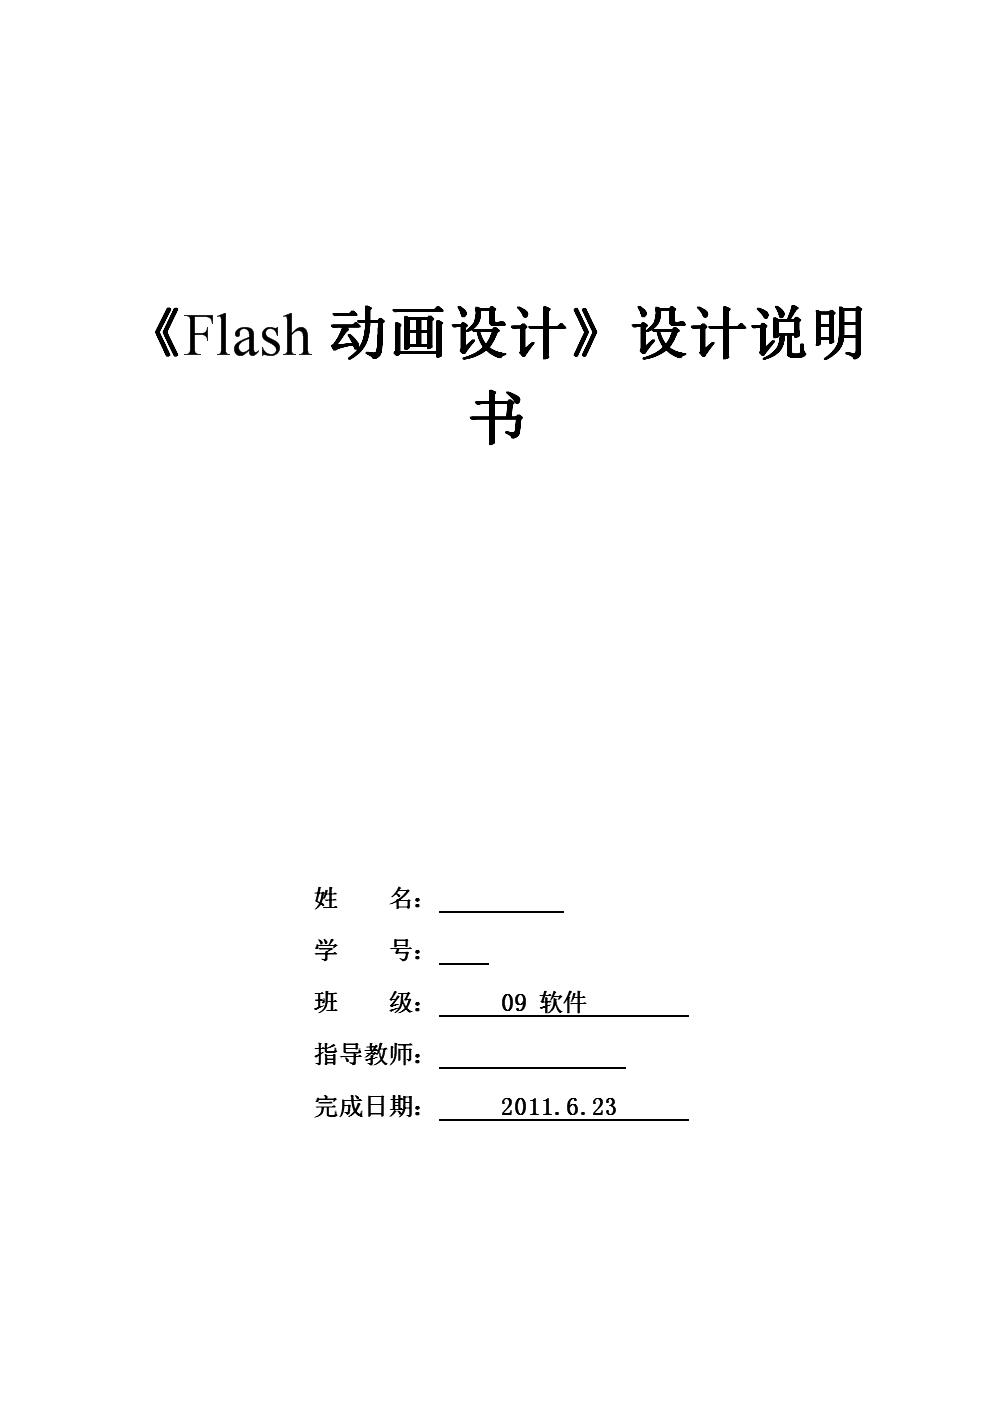 FLASH动画设计》设计说明书.doc